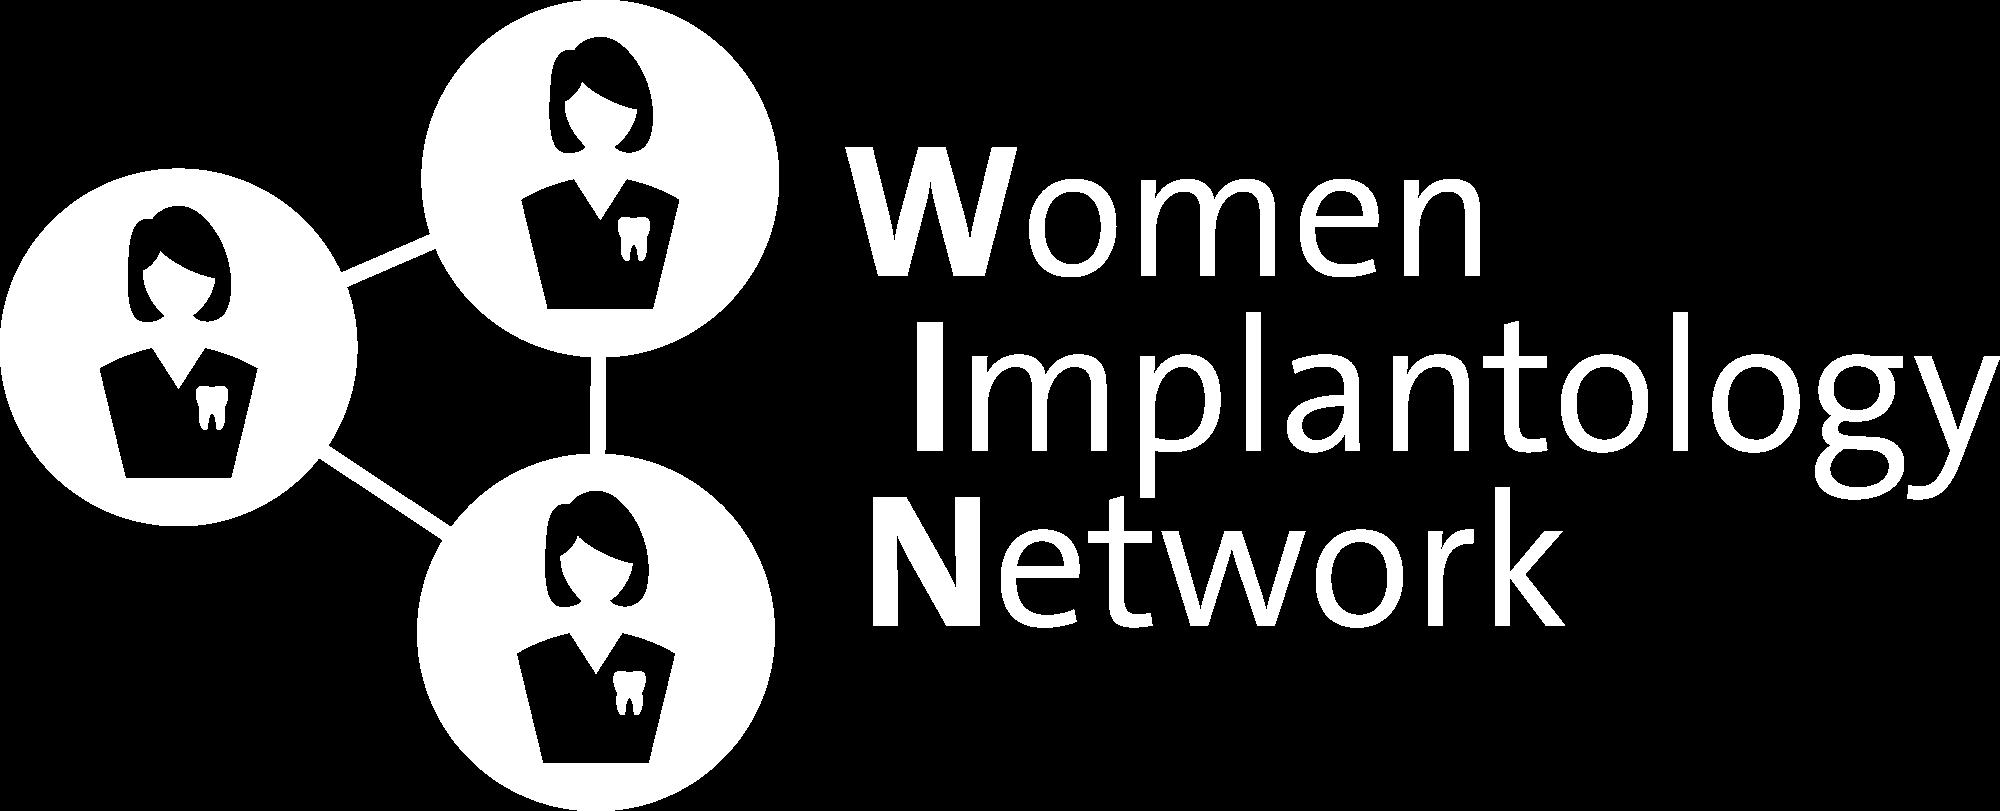 Das Logo des Women Implantology Network.